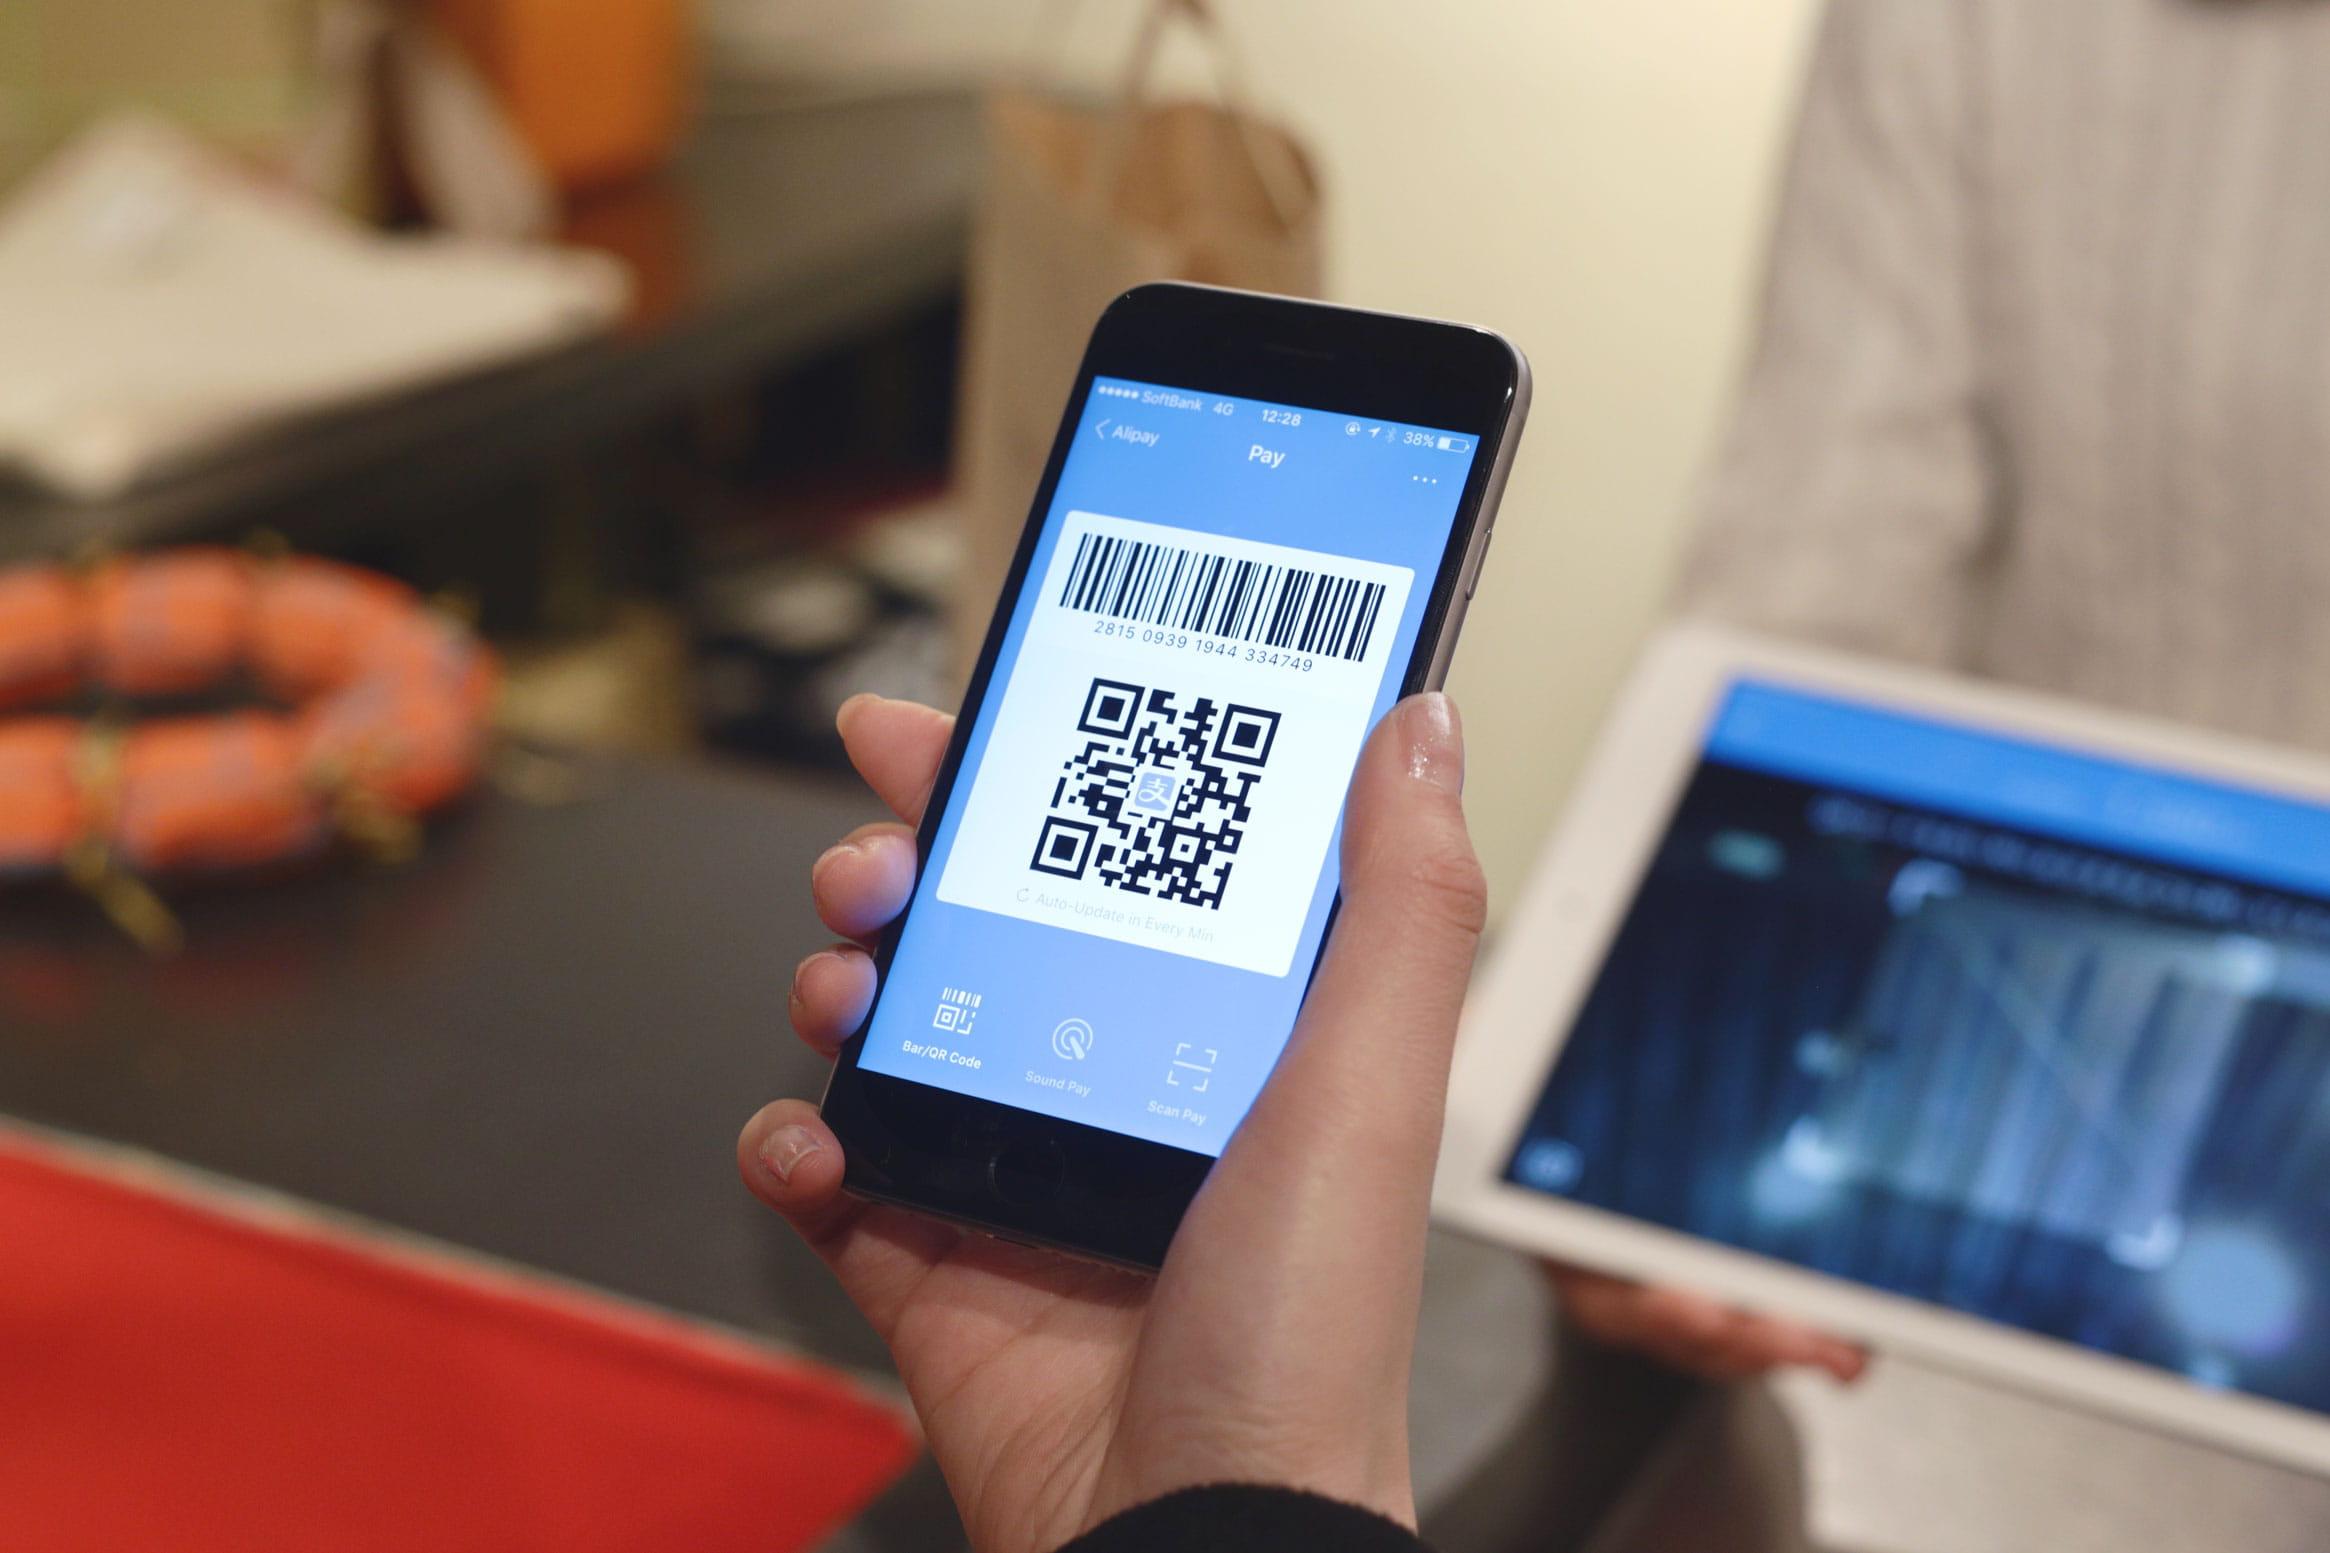 Alipay(アリペイ)は、中国最大級のQR決済アプリ